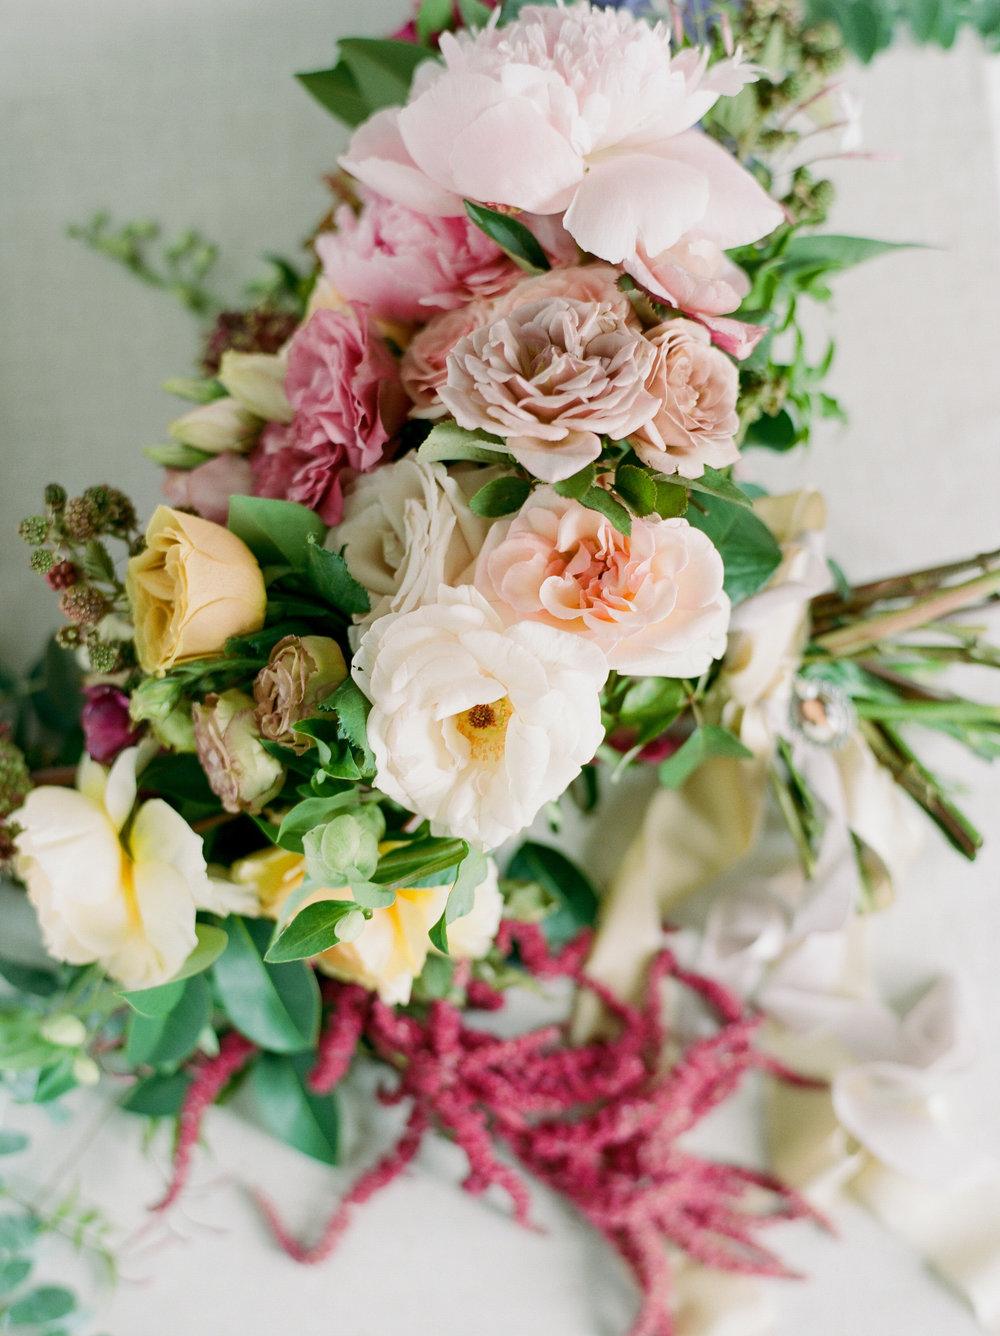 The-Knot-Texas-Fine-Art-Wedding-Film-Destination-Photographer-Houston-Austin-Dallas-New-Orleans-Julia-Ideson-Library-Event-Dana-Josh-Fernandez-Photograph-Top-Best-16.jpg